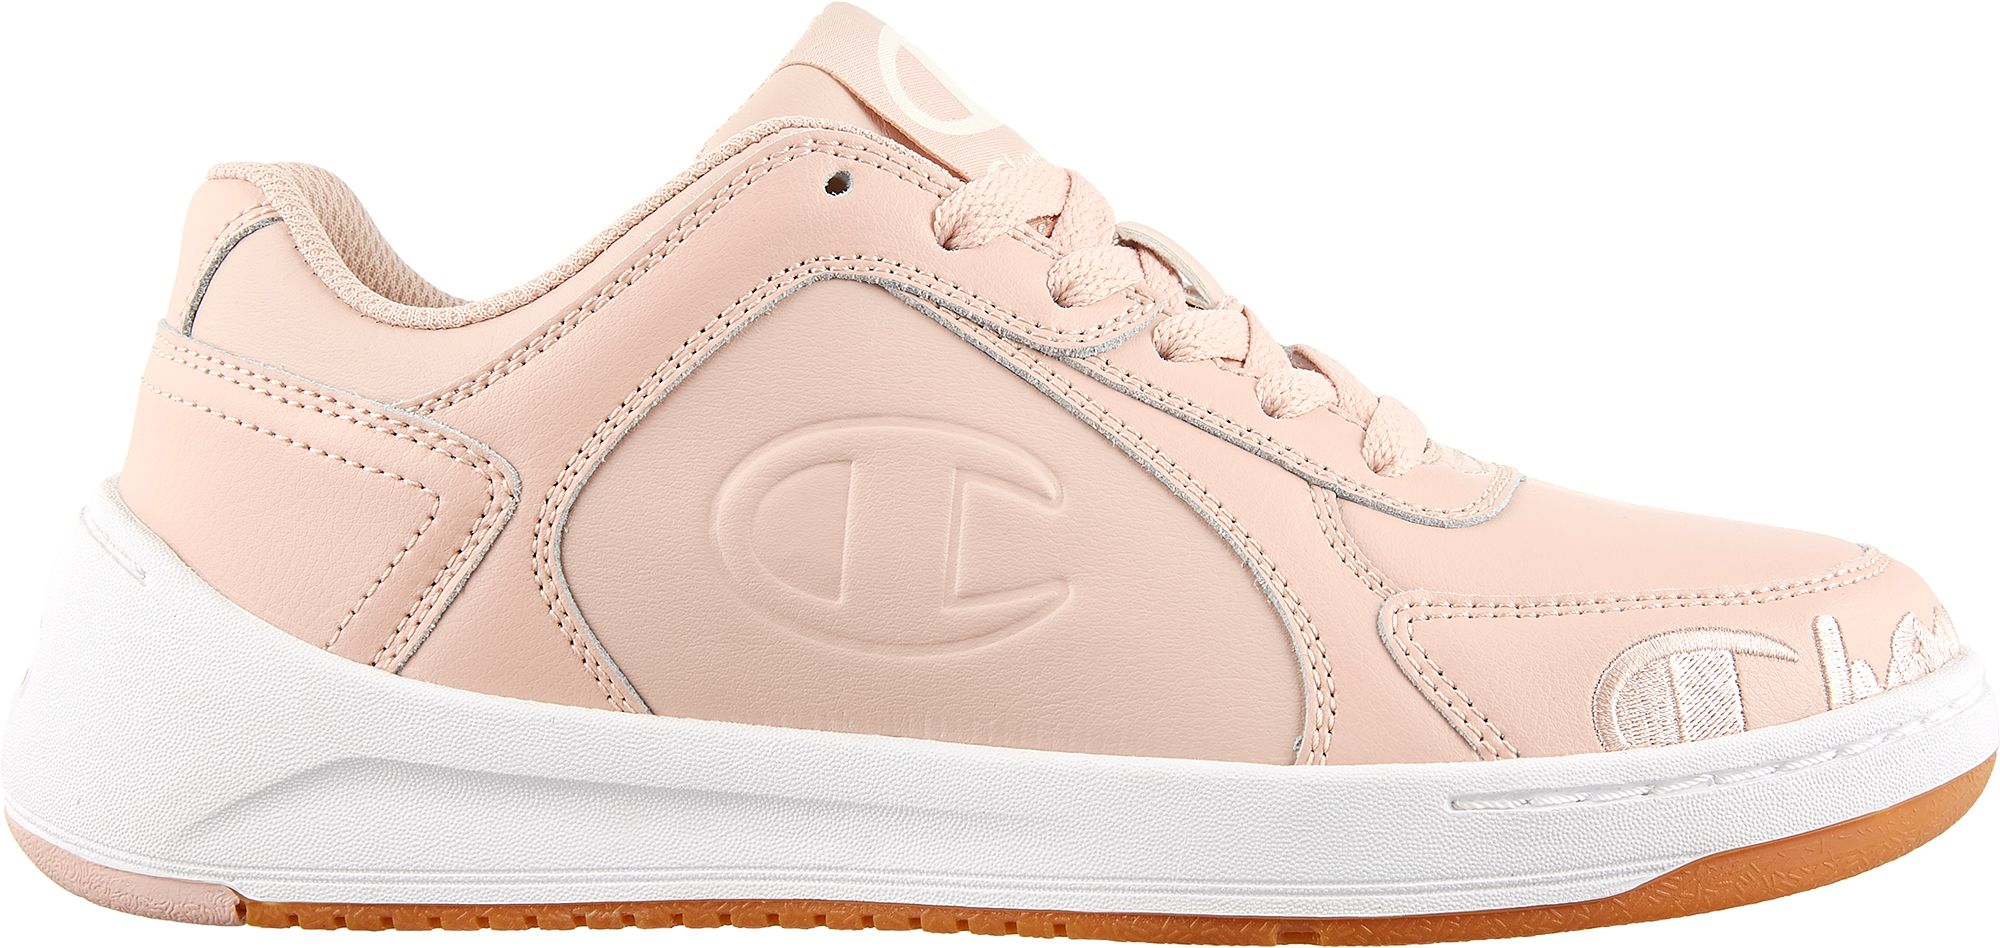 Champion Womens Sneakers \u0026 Athletic